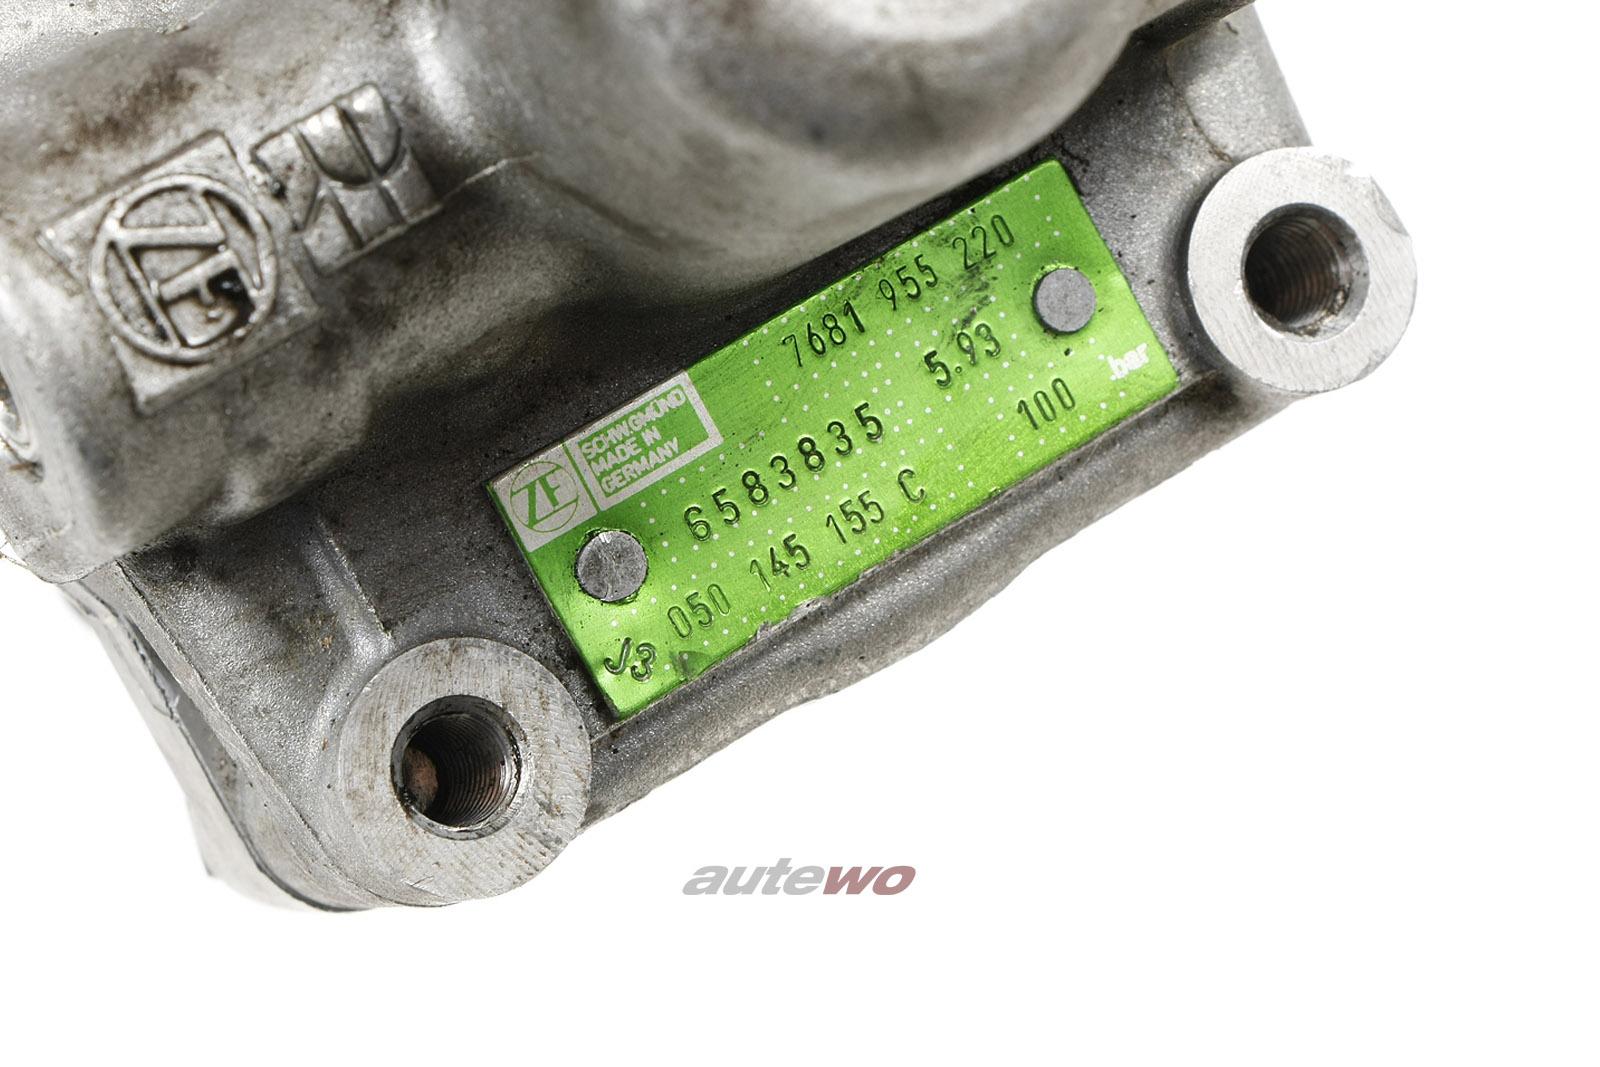 050145155CX 050145155C Audi 80 B4 6 Zylinder Servopumpe